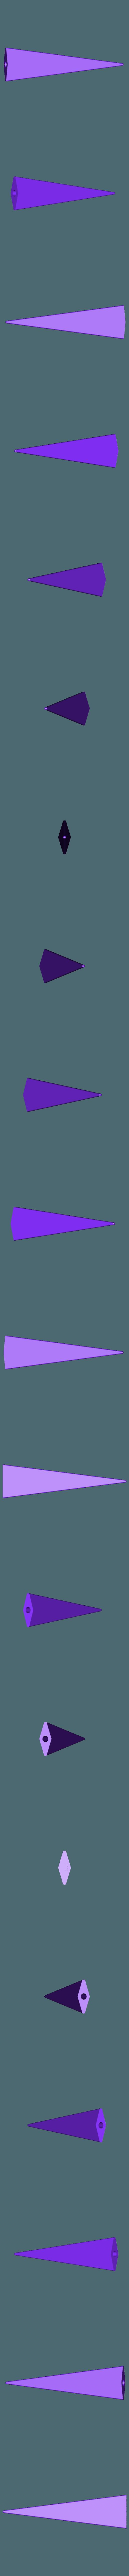 Sharpened Nail 6.stl Download STL file Hollow Knight Sharpened Nail • 3D printable design, glargonoid